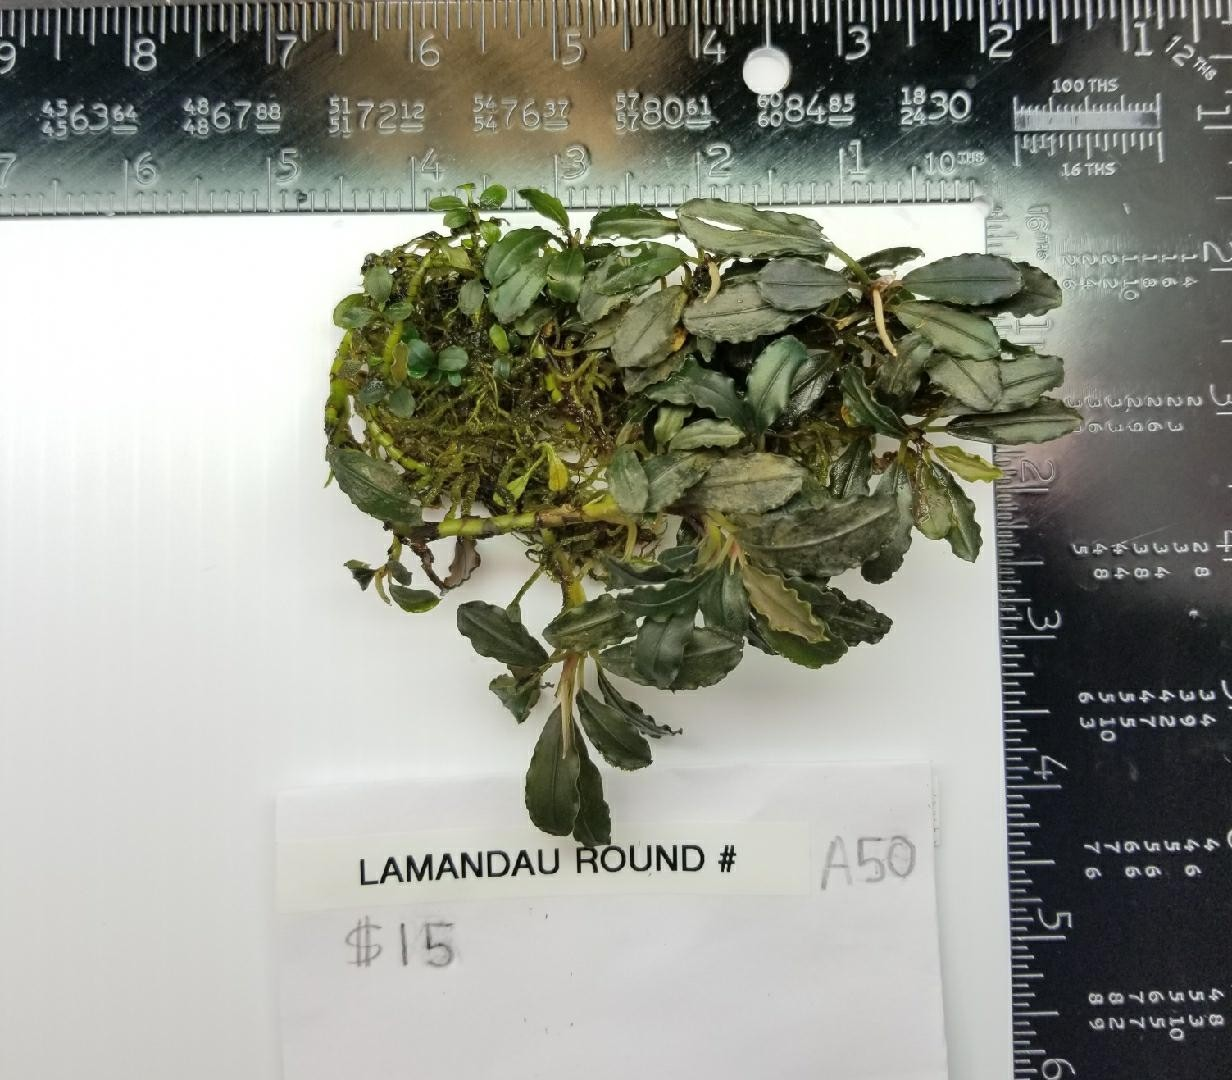 Buce Lanandau Round